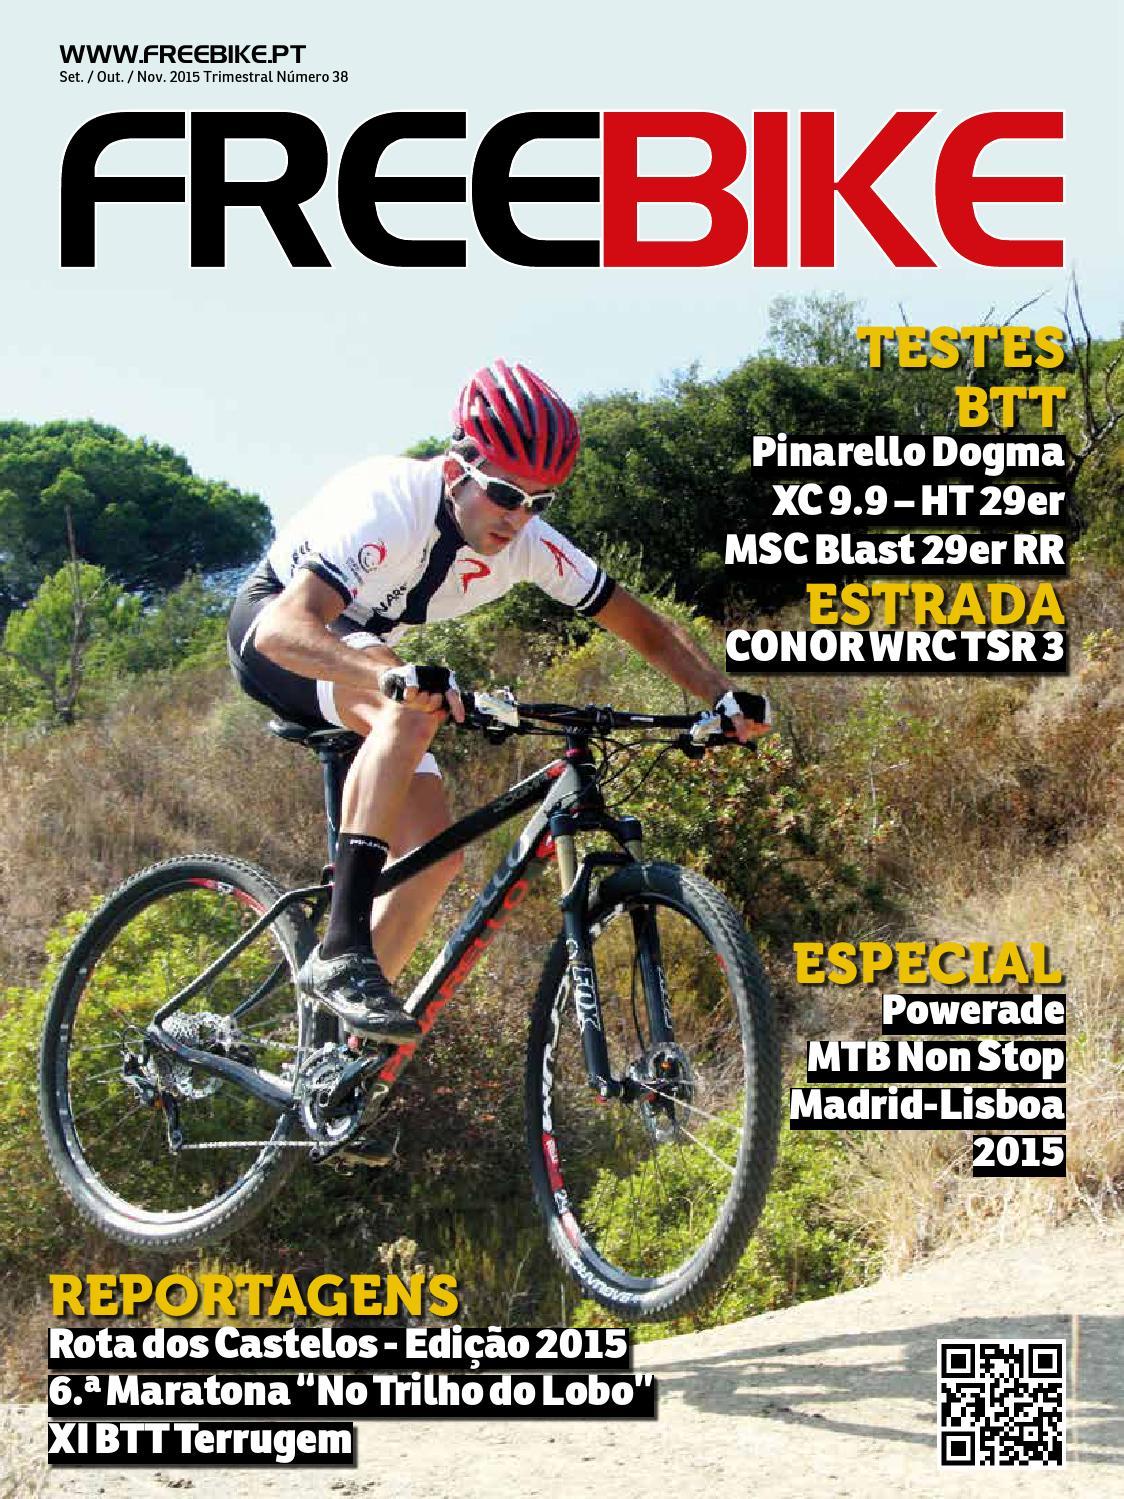 Freebike038 by Freebike - issuu c6b0db710f3f5